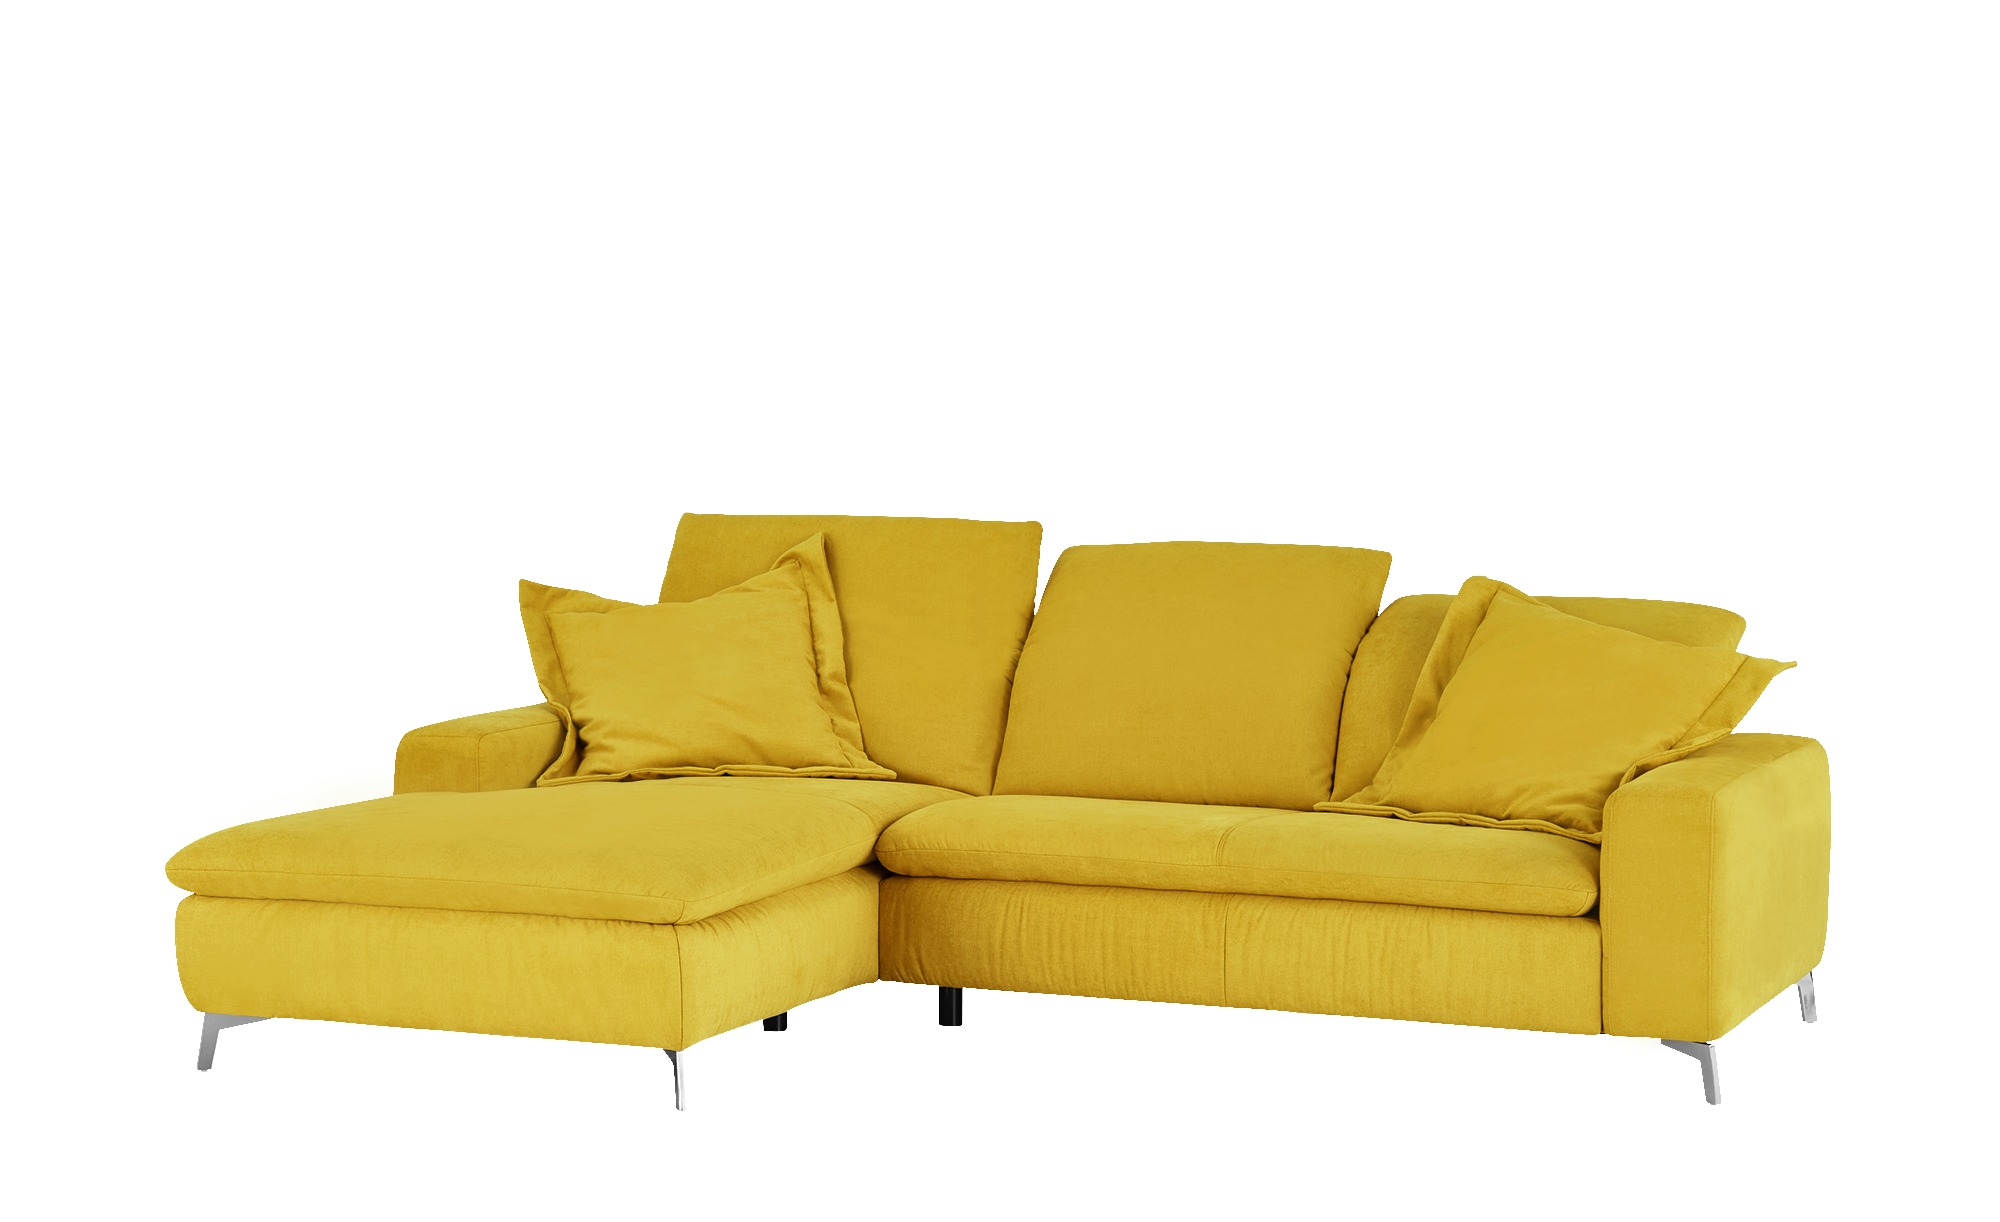 Ecksofa   Habitus ¦ gelb ¦ Maße (cm): B: 191 T: 270 Polstermöbel > Sofas > Ecksofas - Höffner